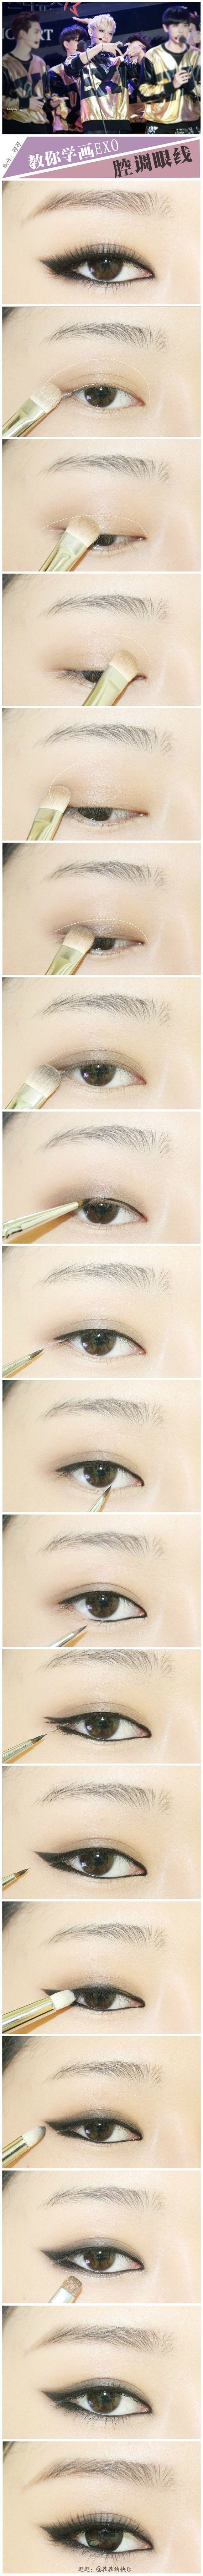 sometimes i wish i was asian, so i had eyes like this. soooo pretty! but then again, i love my eye shape~<3